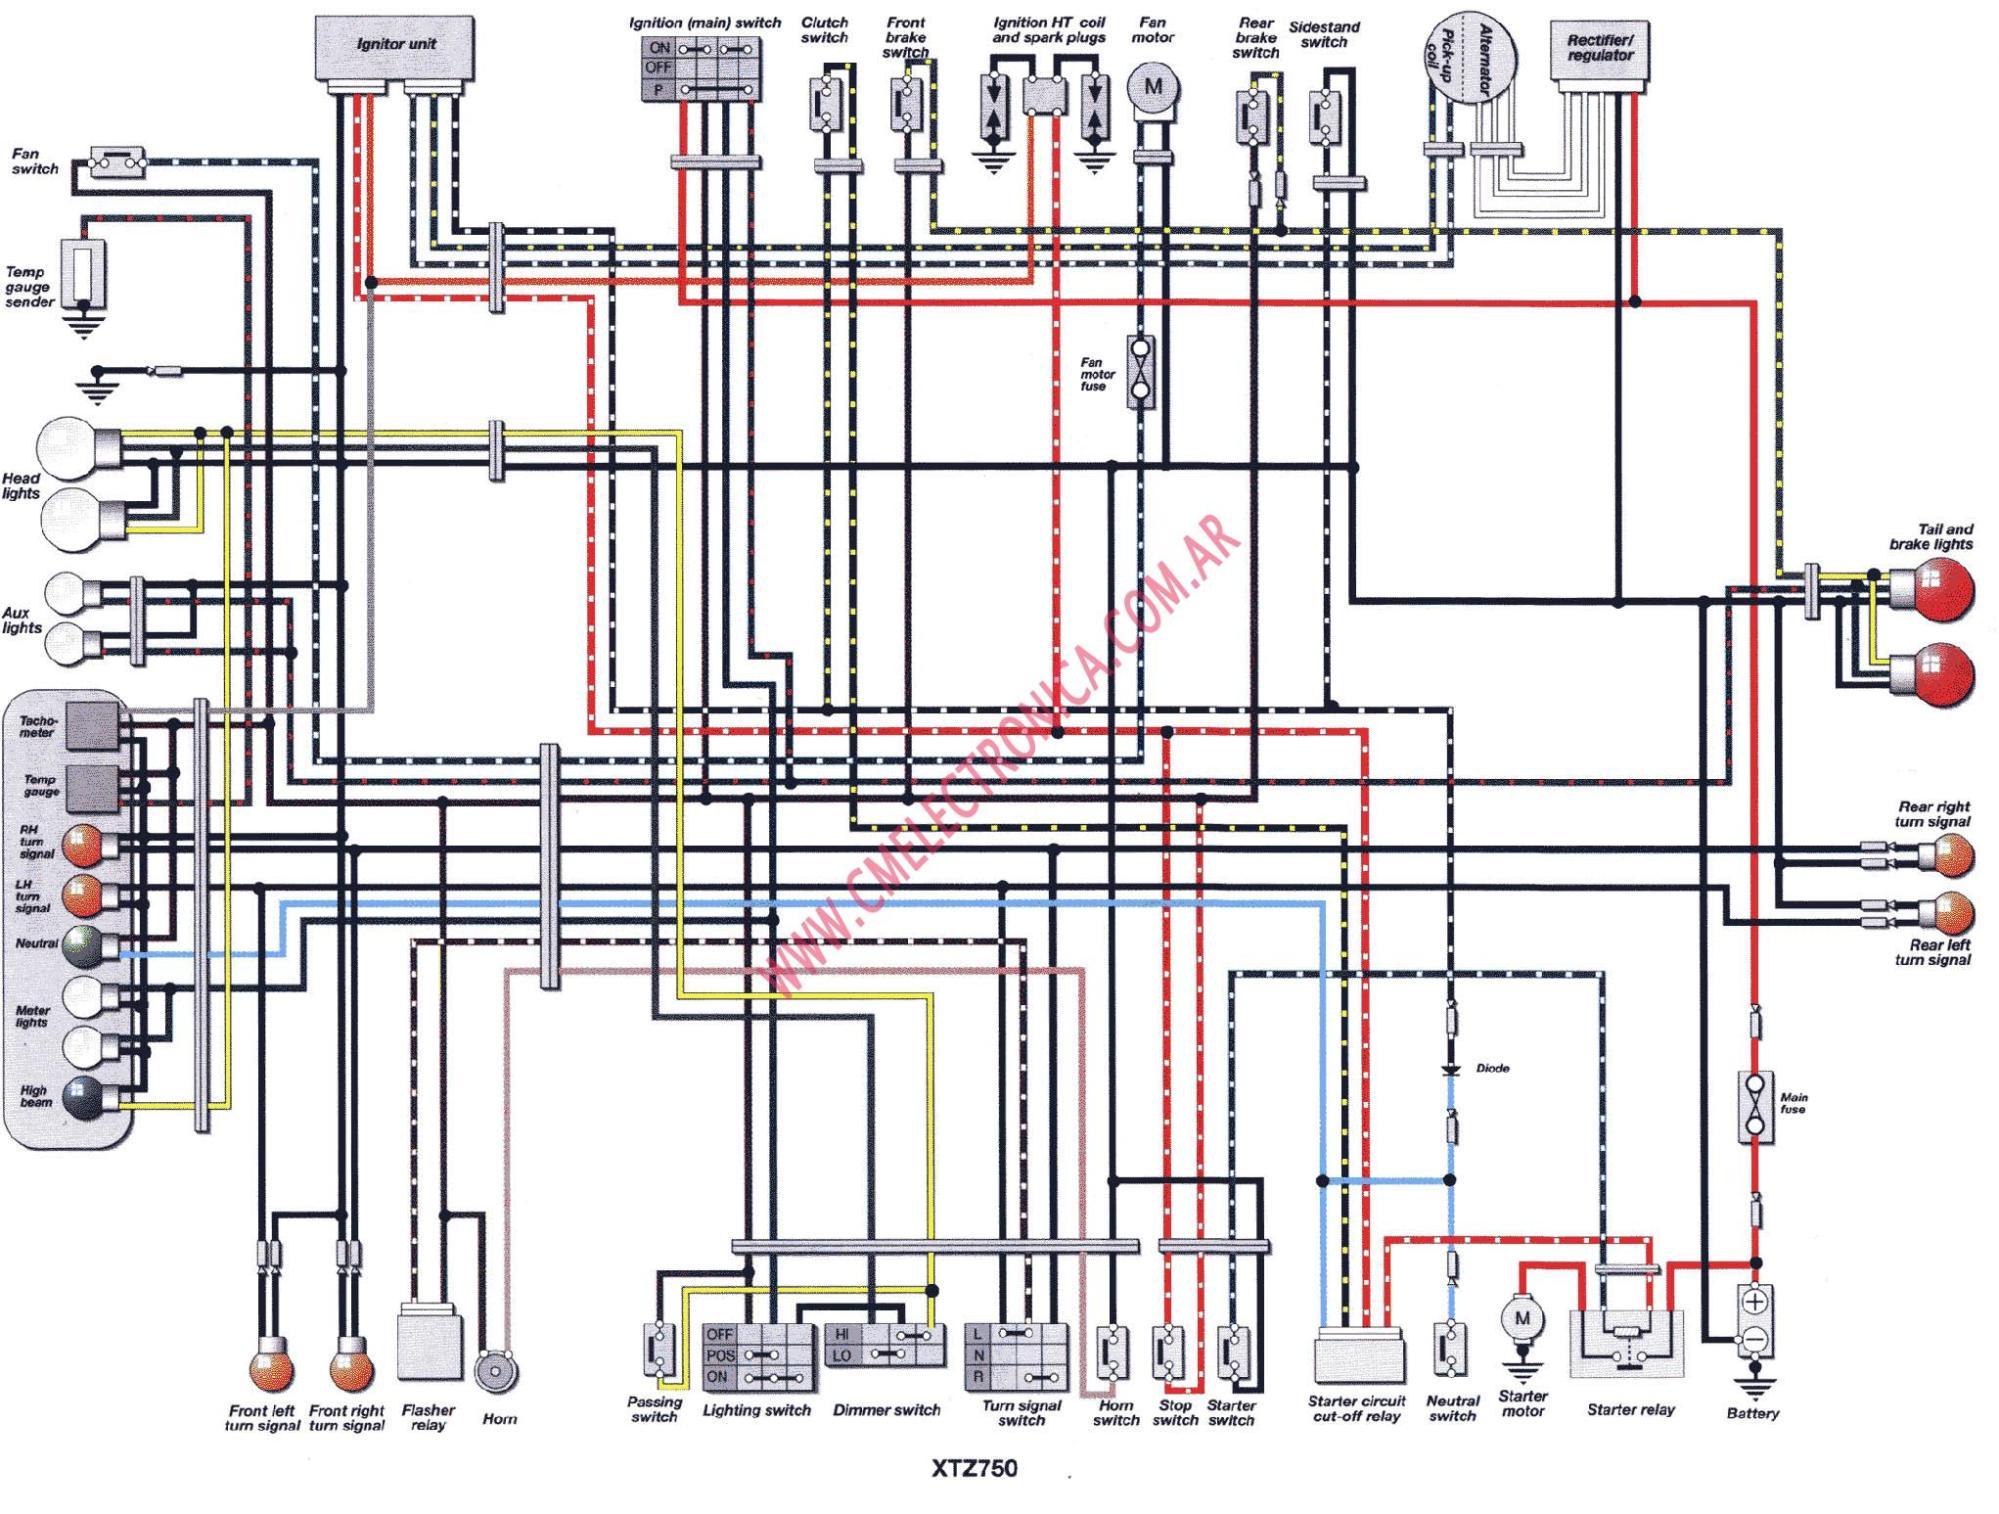 hight resolution of location of fuse box 1982 honda goldwing location free 1995 yamaha virago 750 wiring diagram